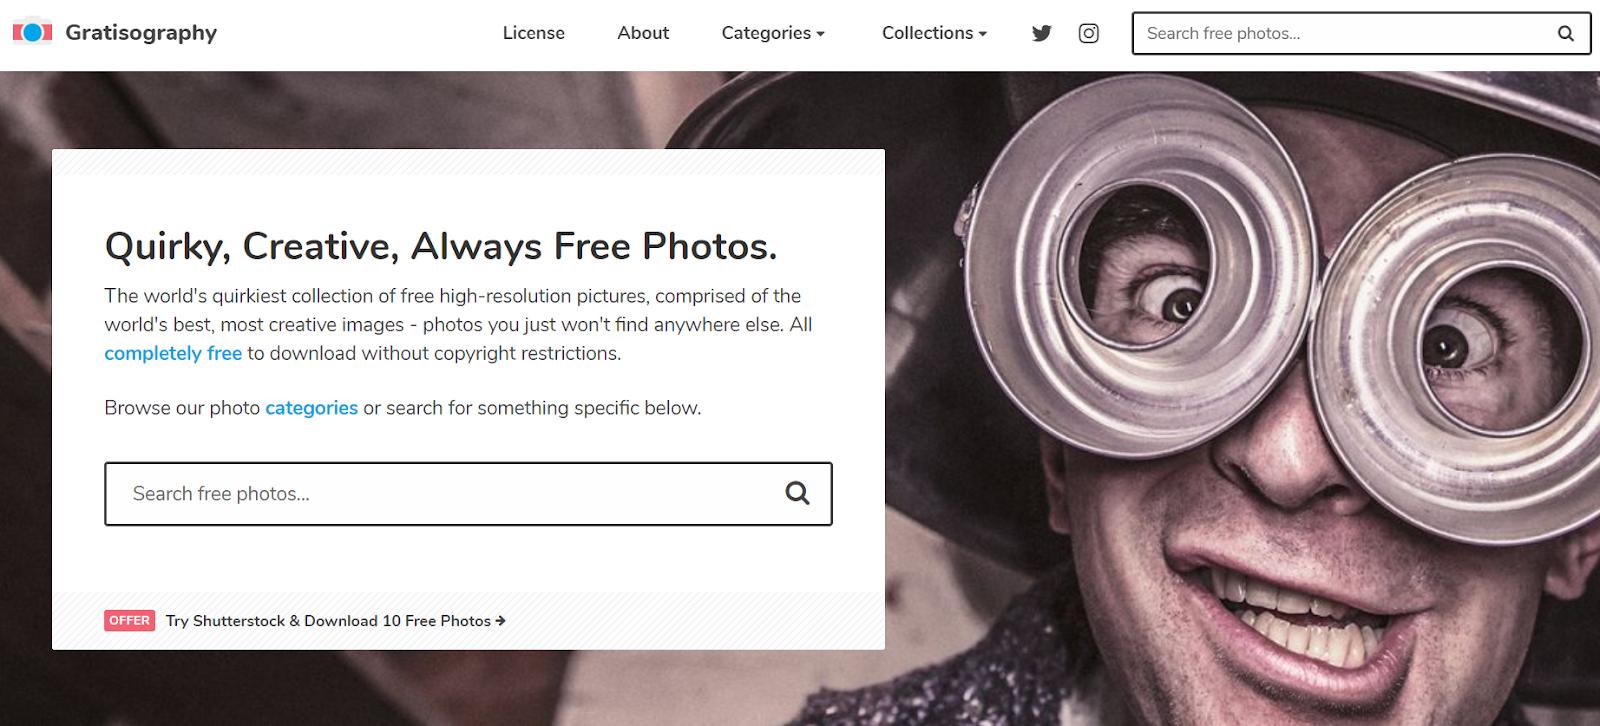 gratisography - banque d'images loufoques